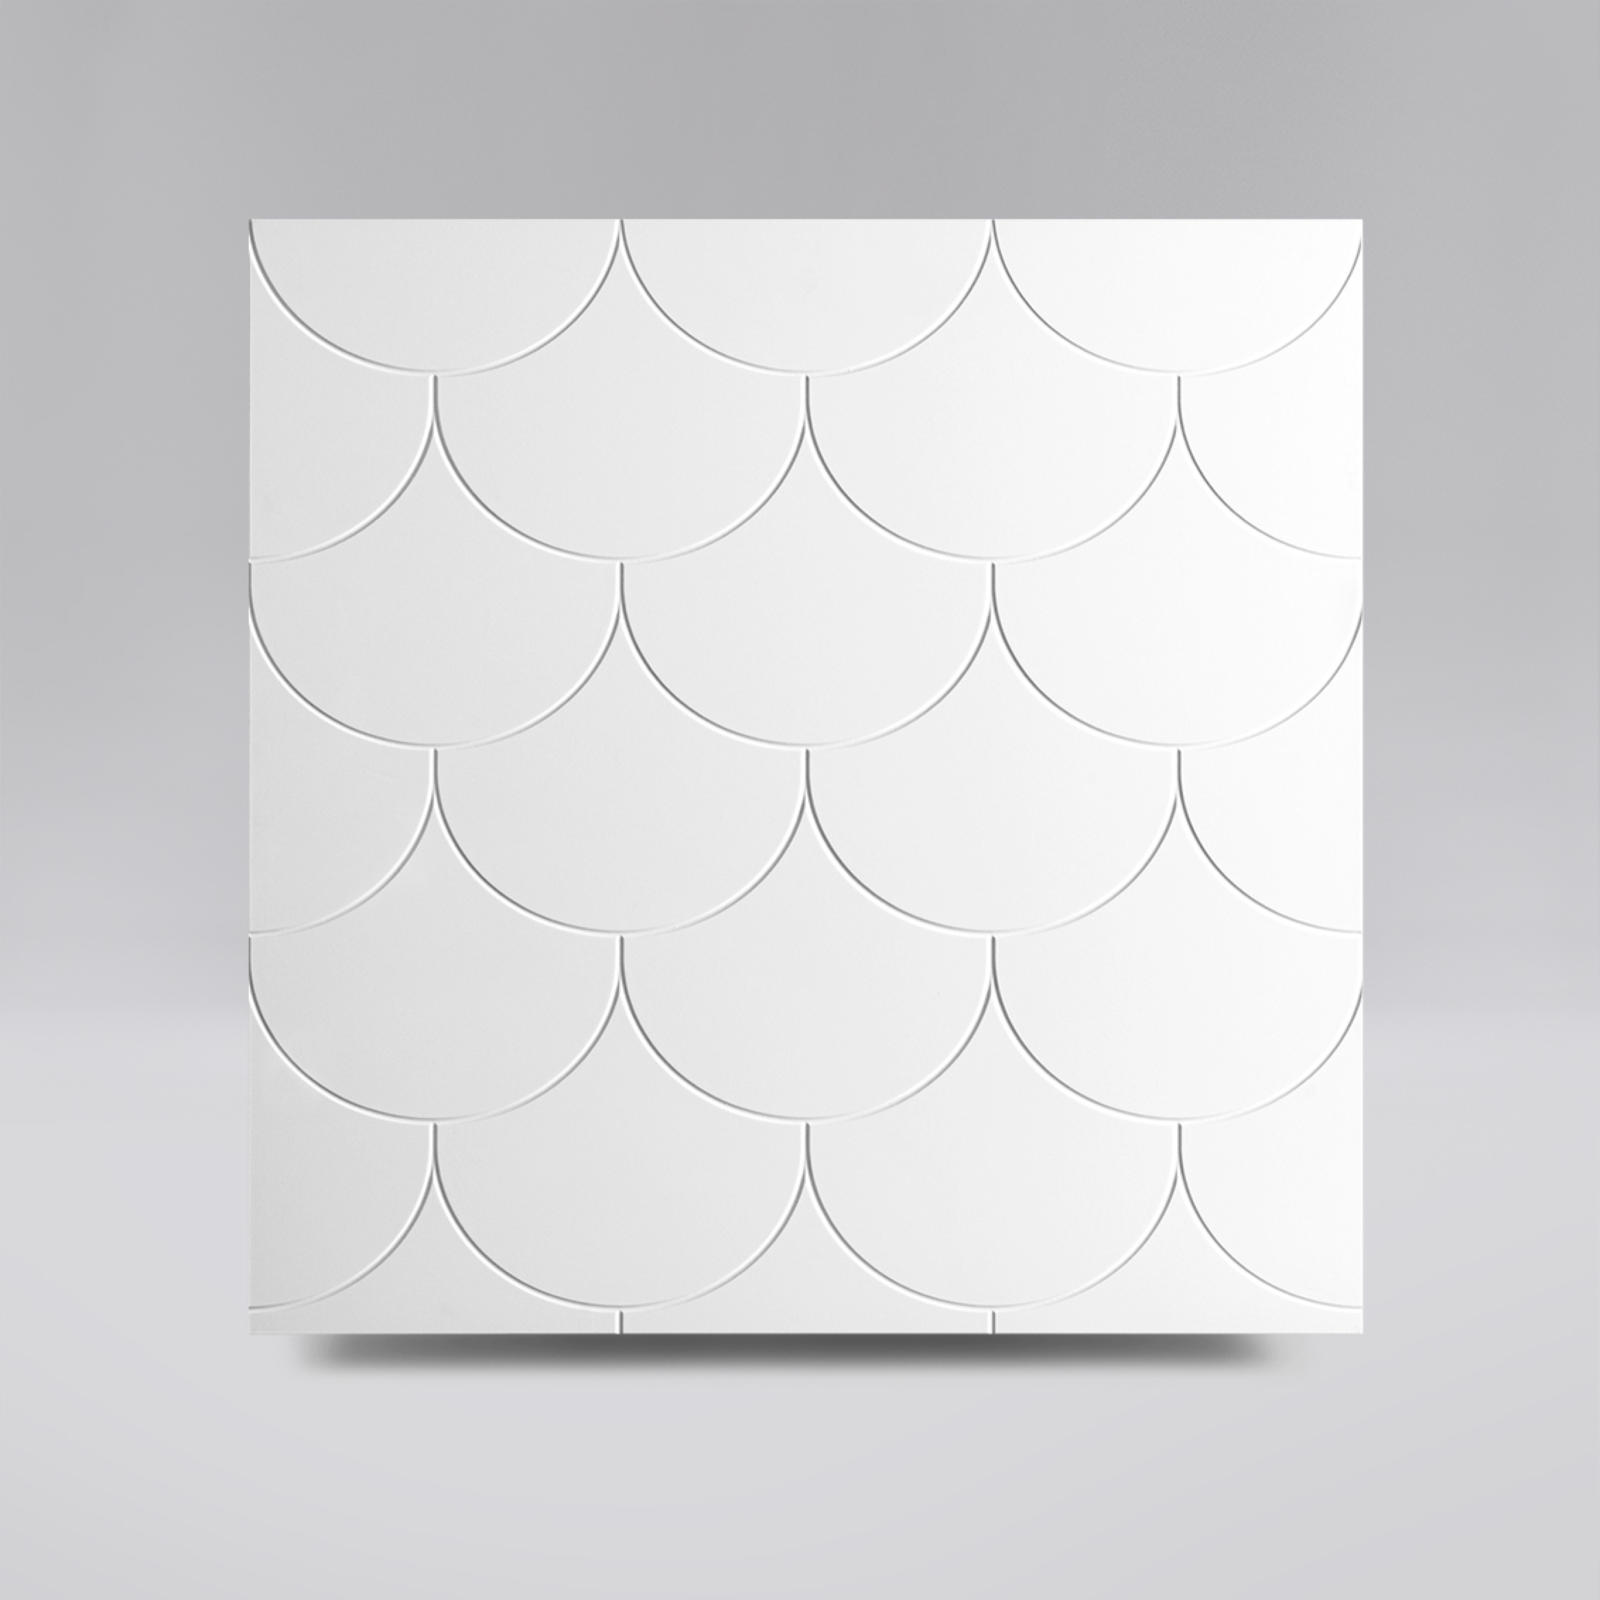 grey, scandinavian, скандинавский интерьер, модный серый, мебель, фасады, комоды